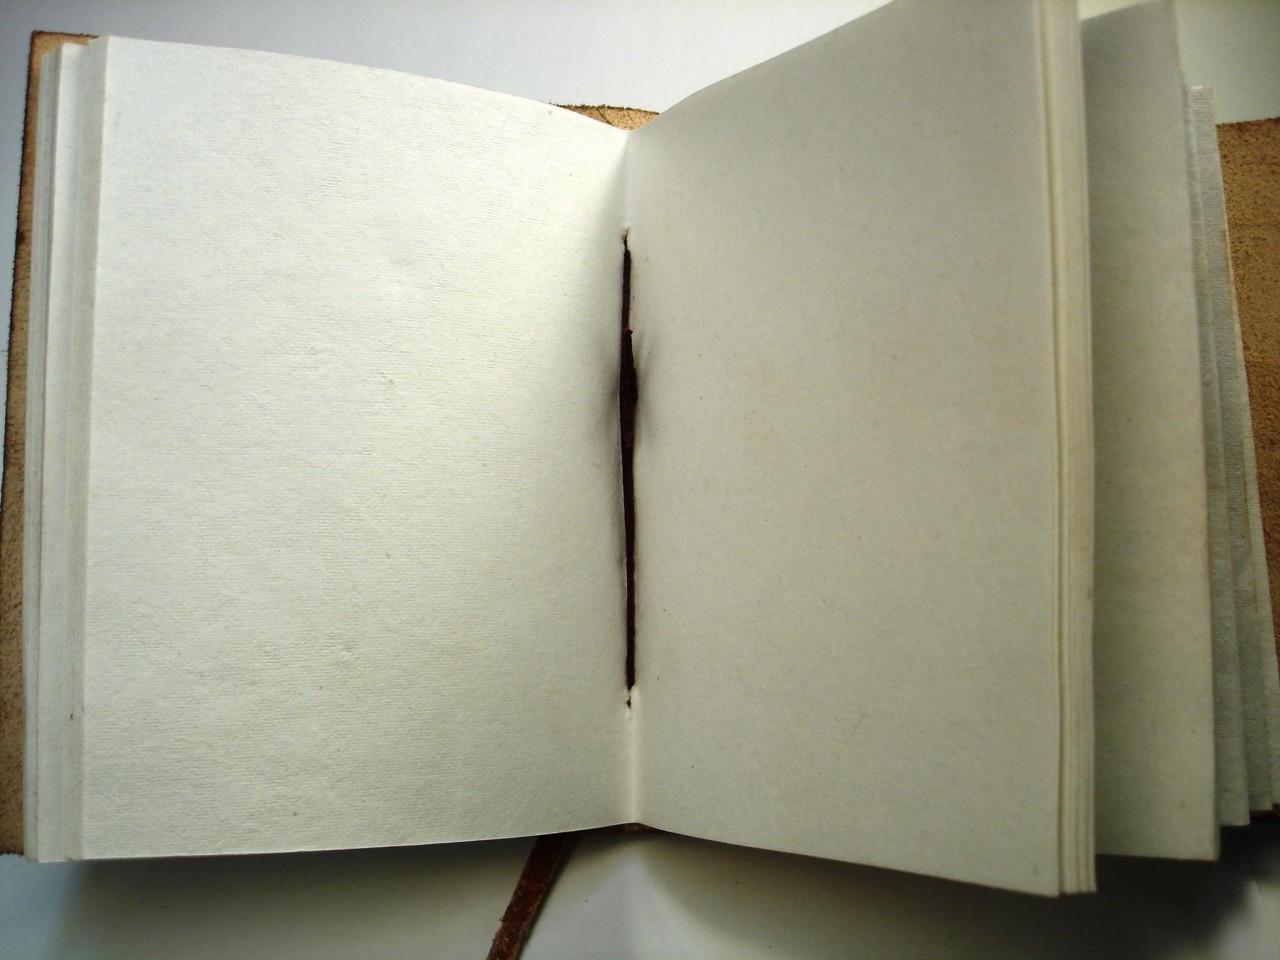 cotton paper inside journal